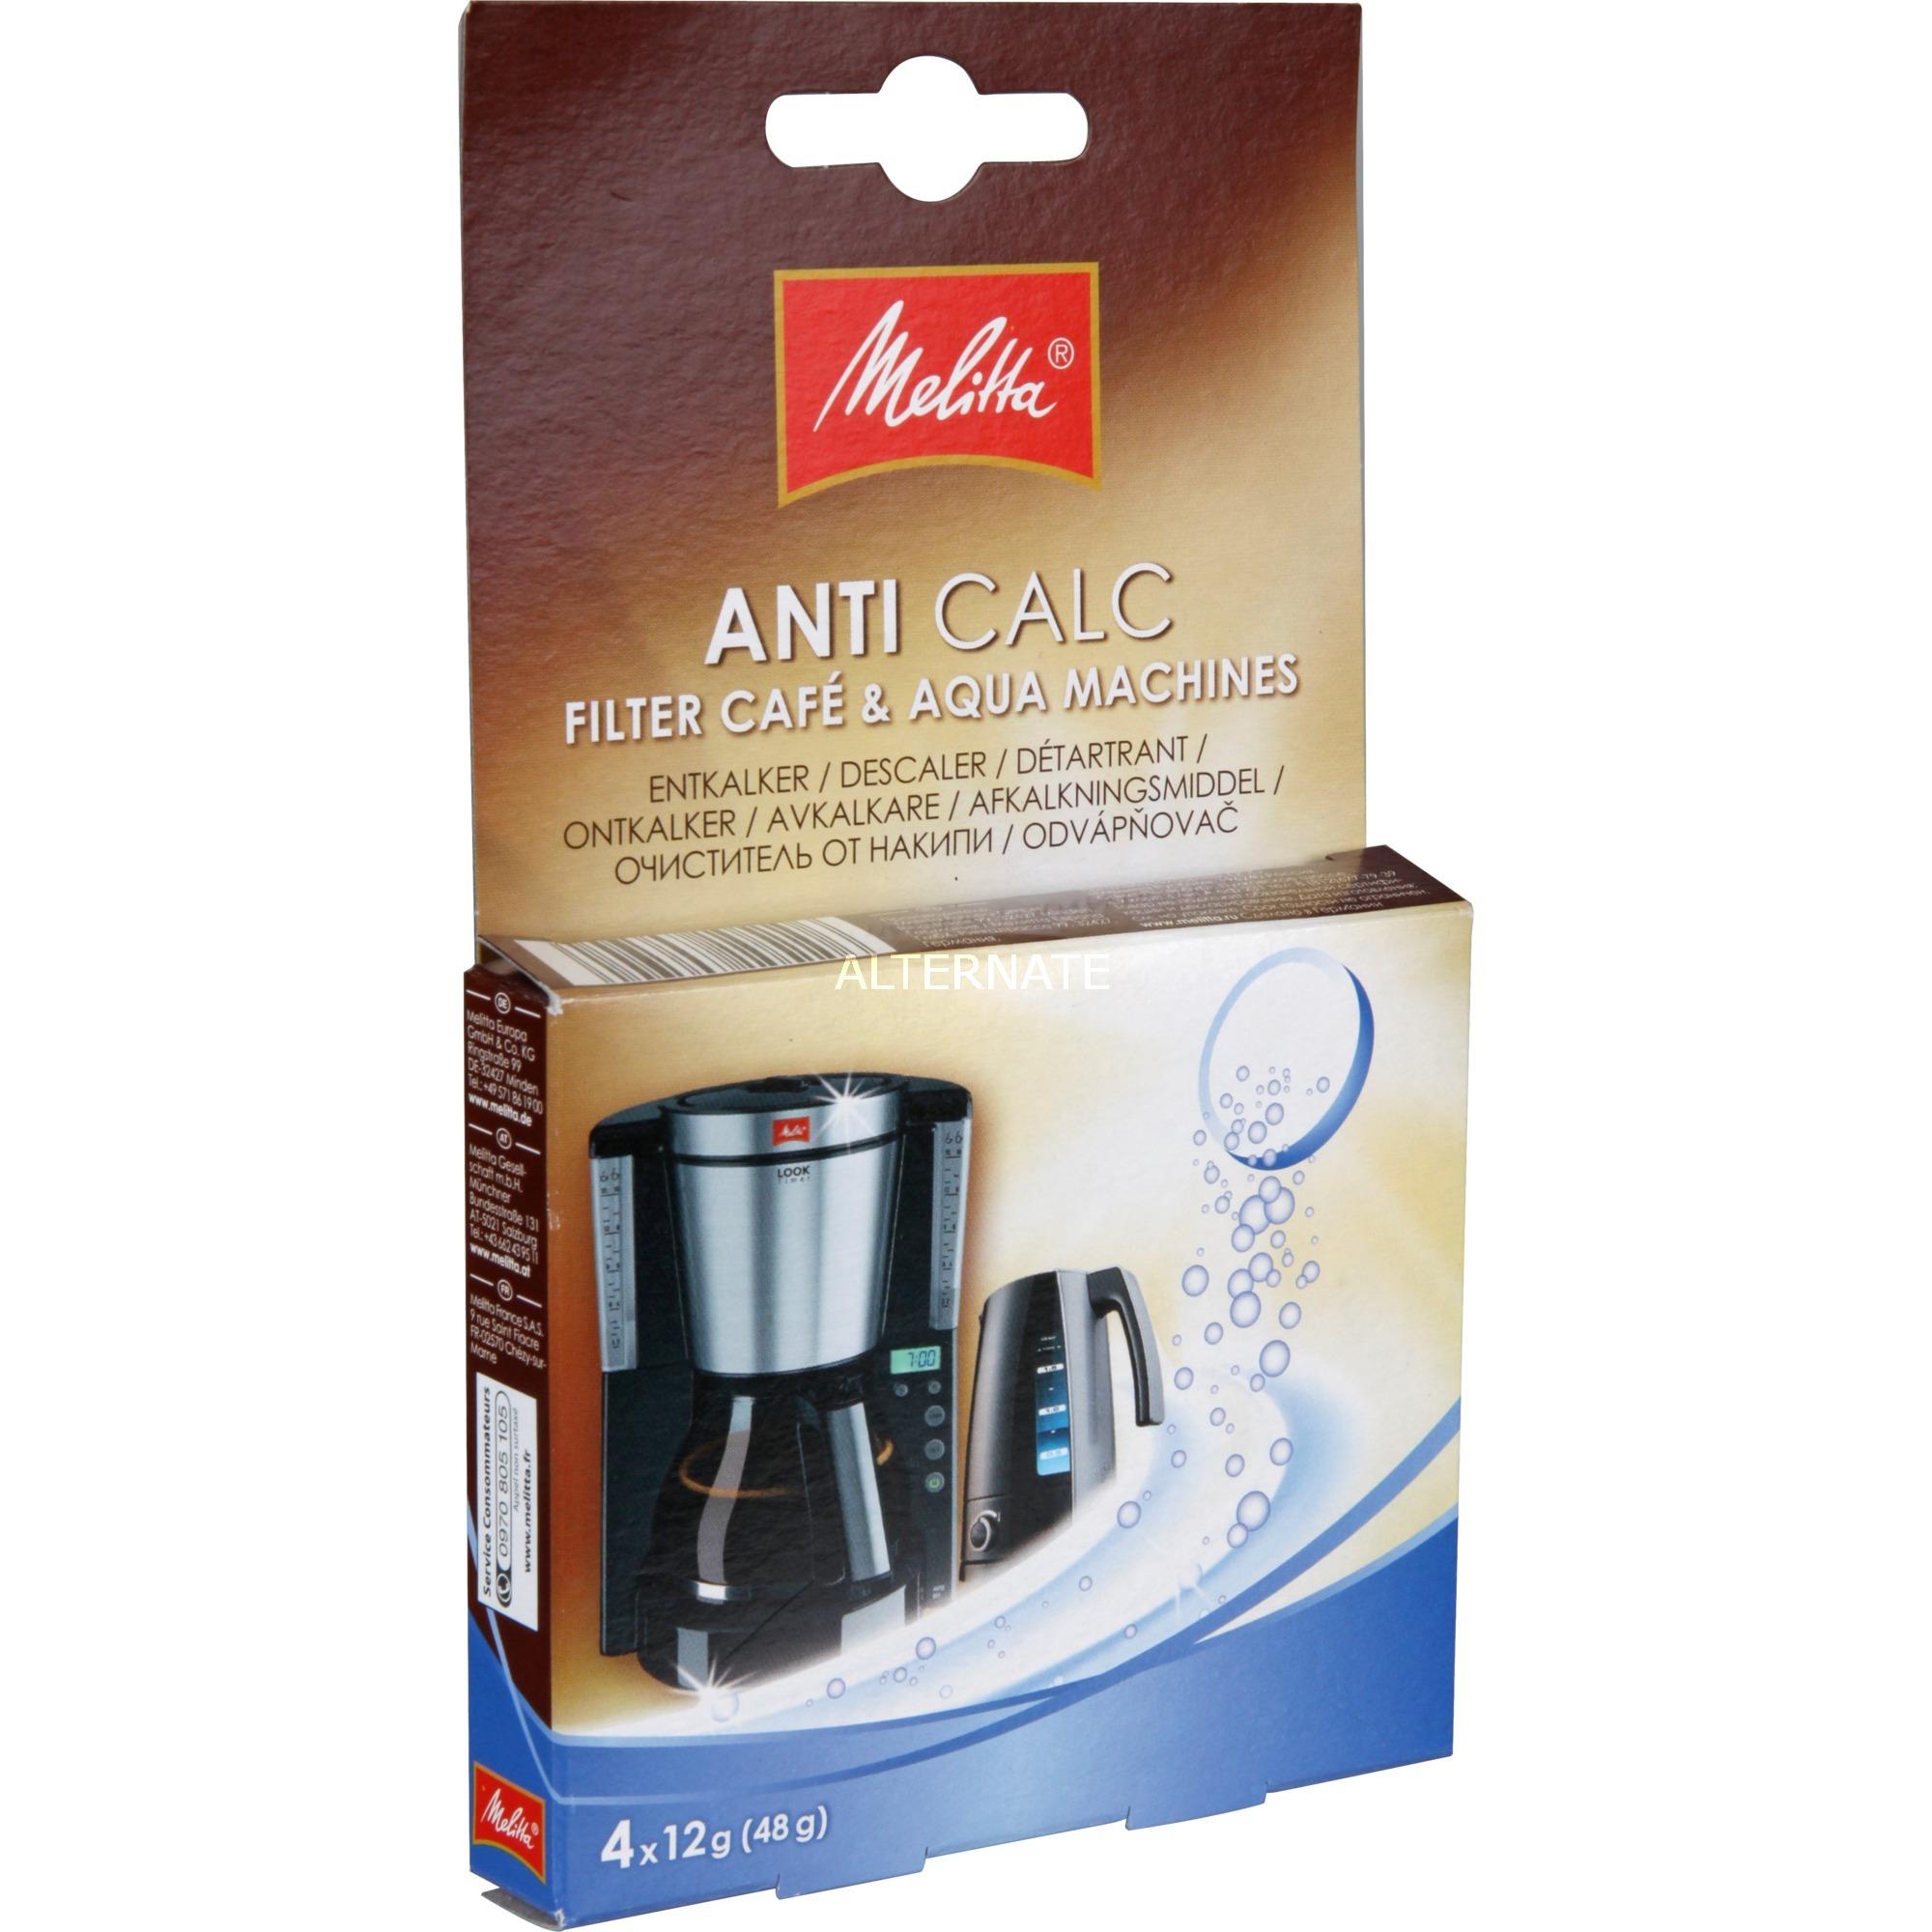 ANTI CALC Café Machines Liquid descalers Electrodomésticos 250 ml, Descalcificador